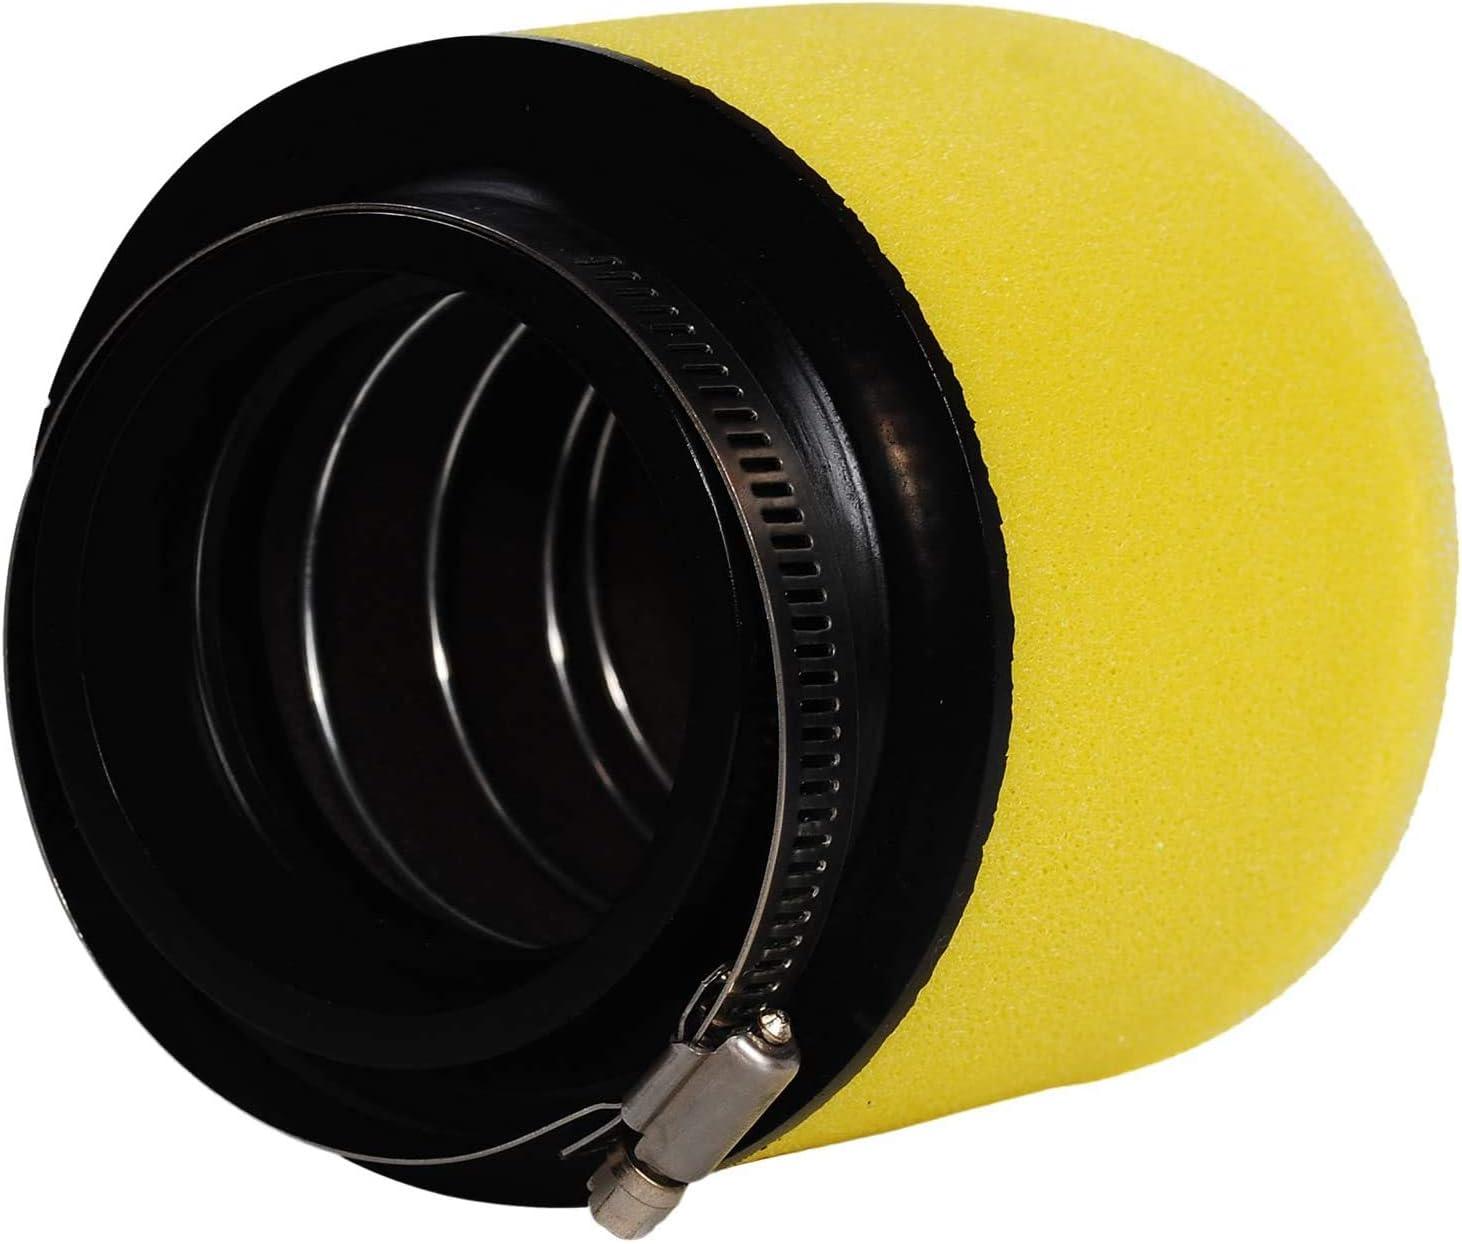 Mingdun Dual Stage Air Filter for Arctic Cat 375 400 454 500 4X4 ATV 0470-391 0470-322